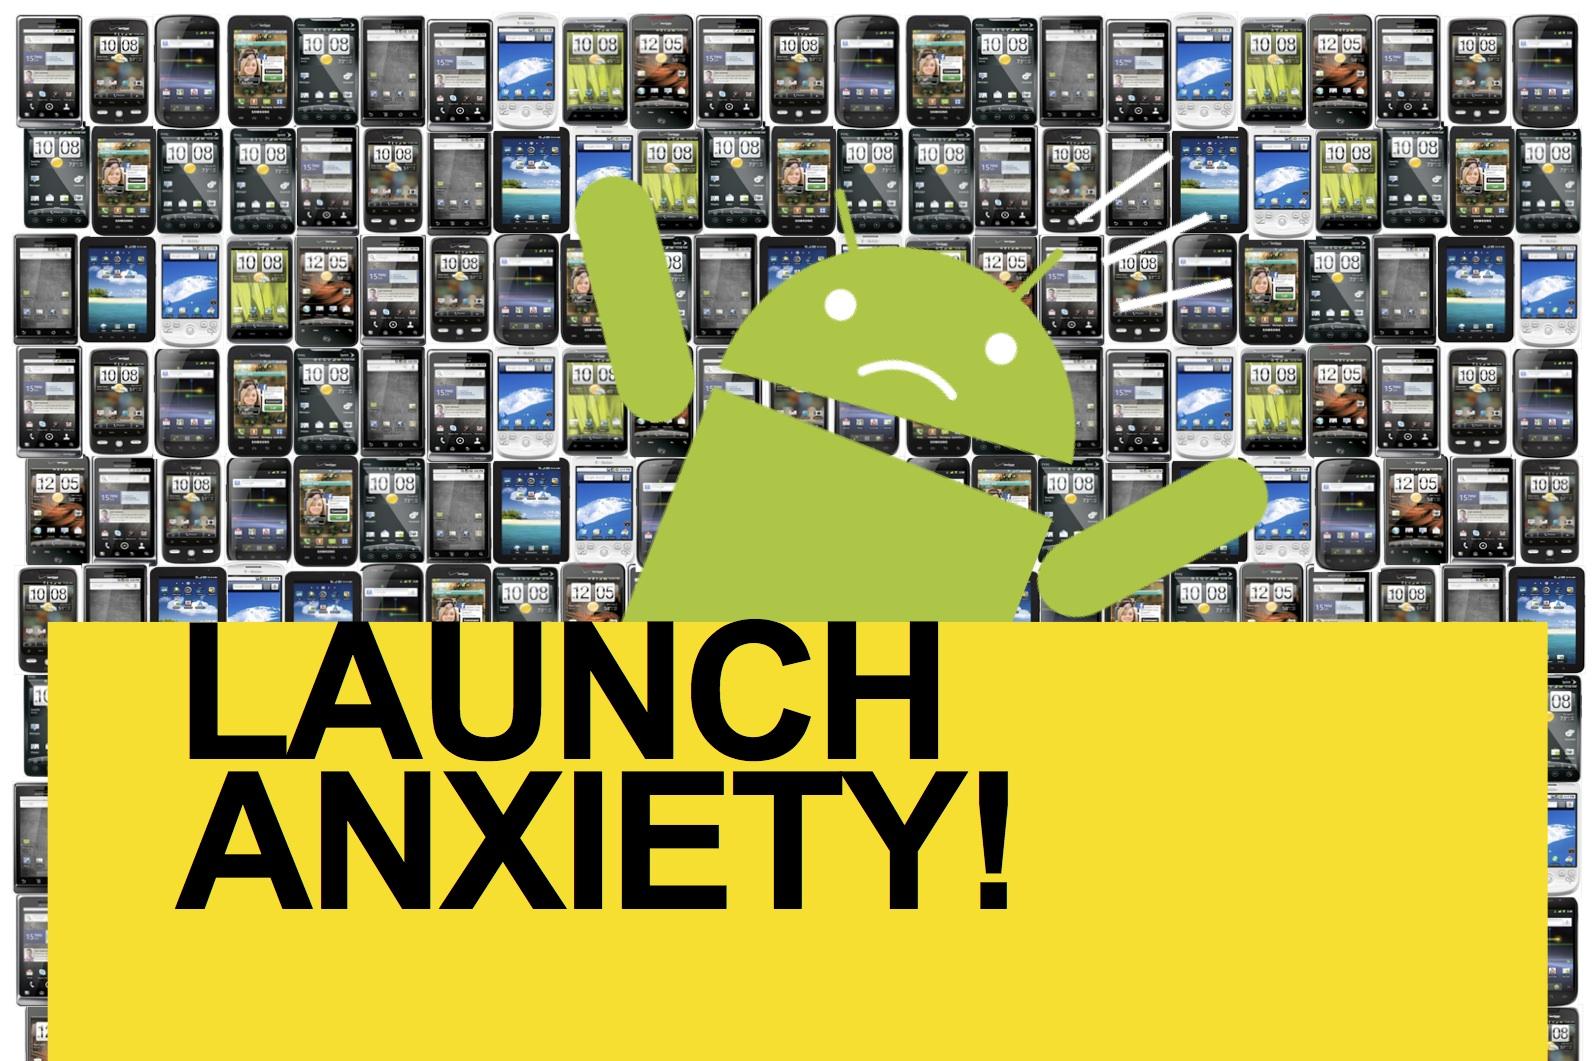 anxiety app